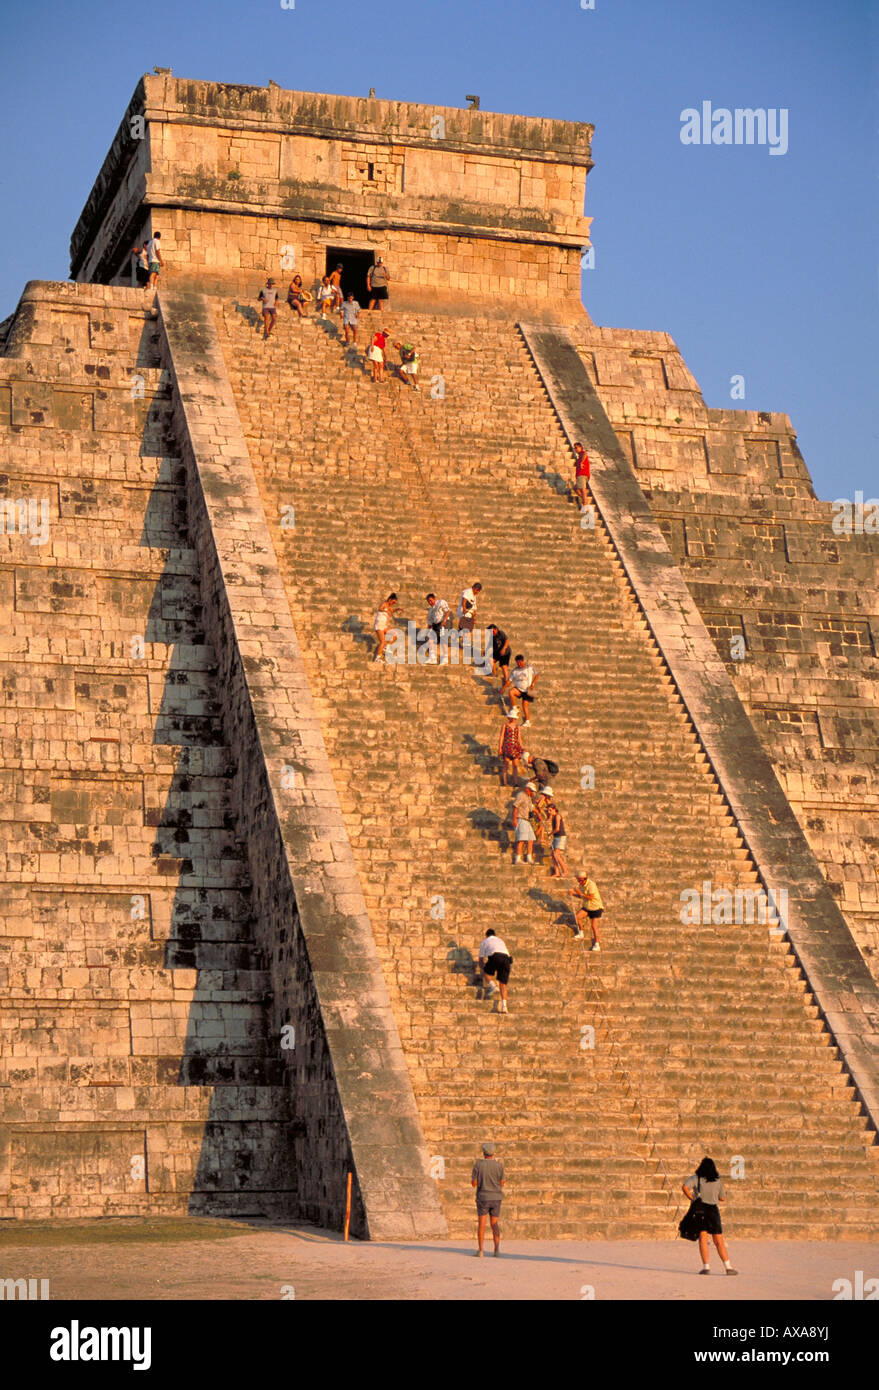 Elk156 1825 Mexico Yucatan Chichen Itza El Castillo Pyramid of Kukulcan Mayan Post Classic Toltec period 900 1200 - Stock Image